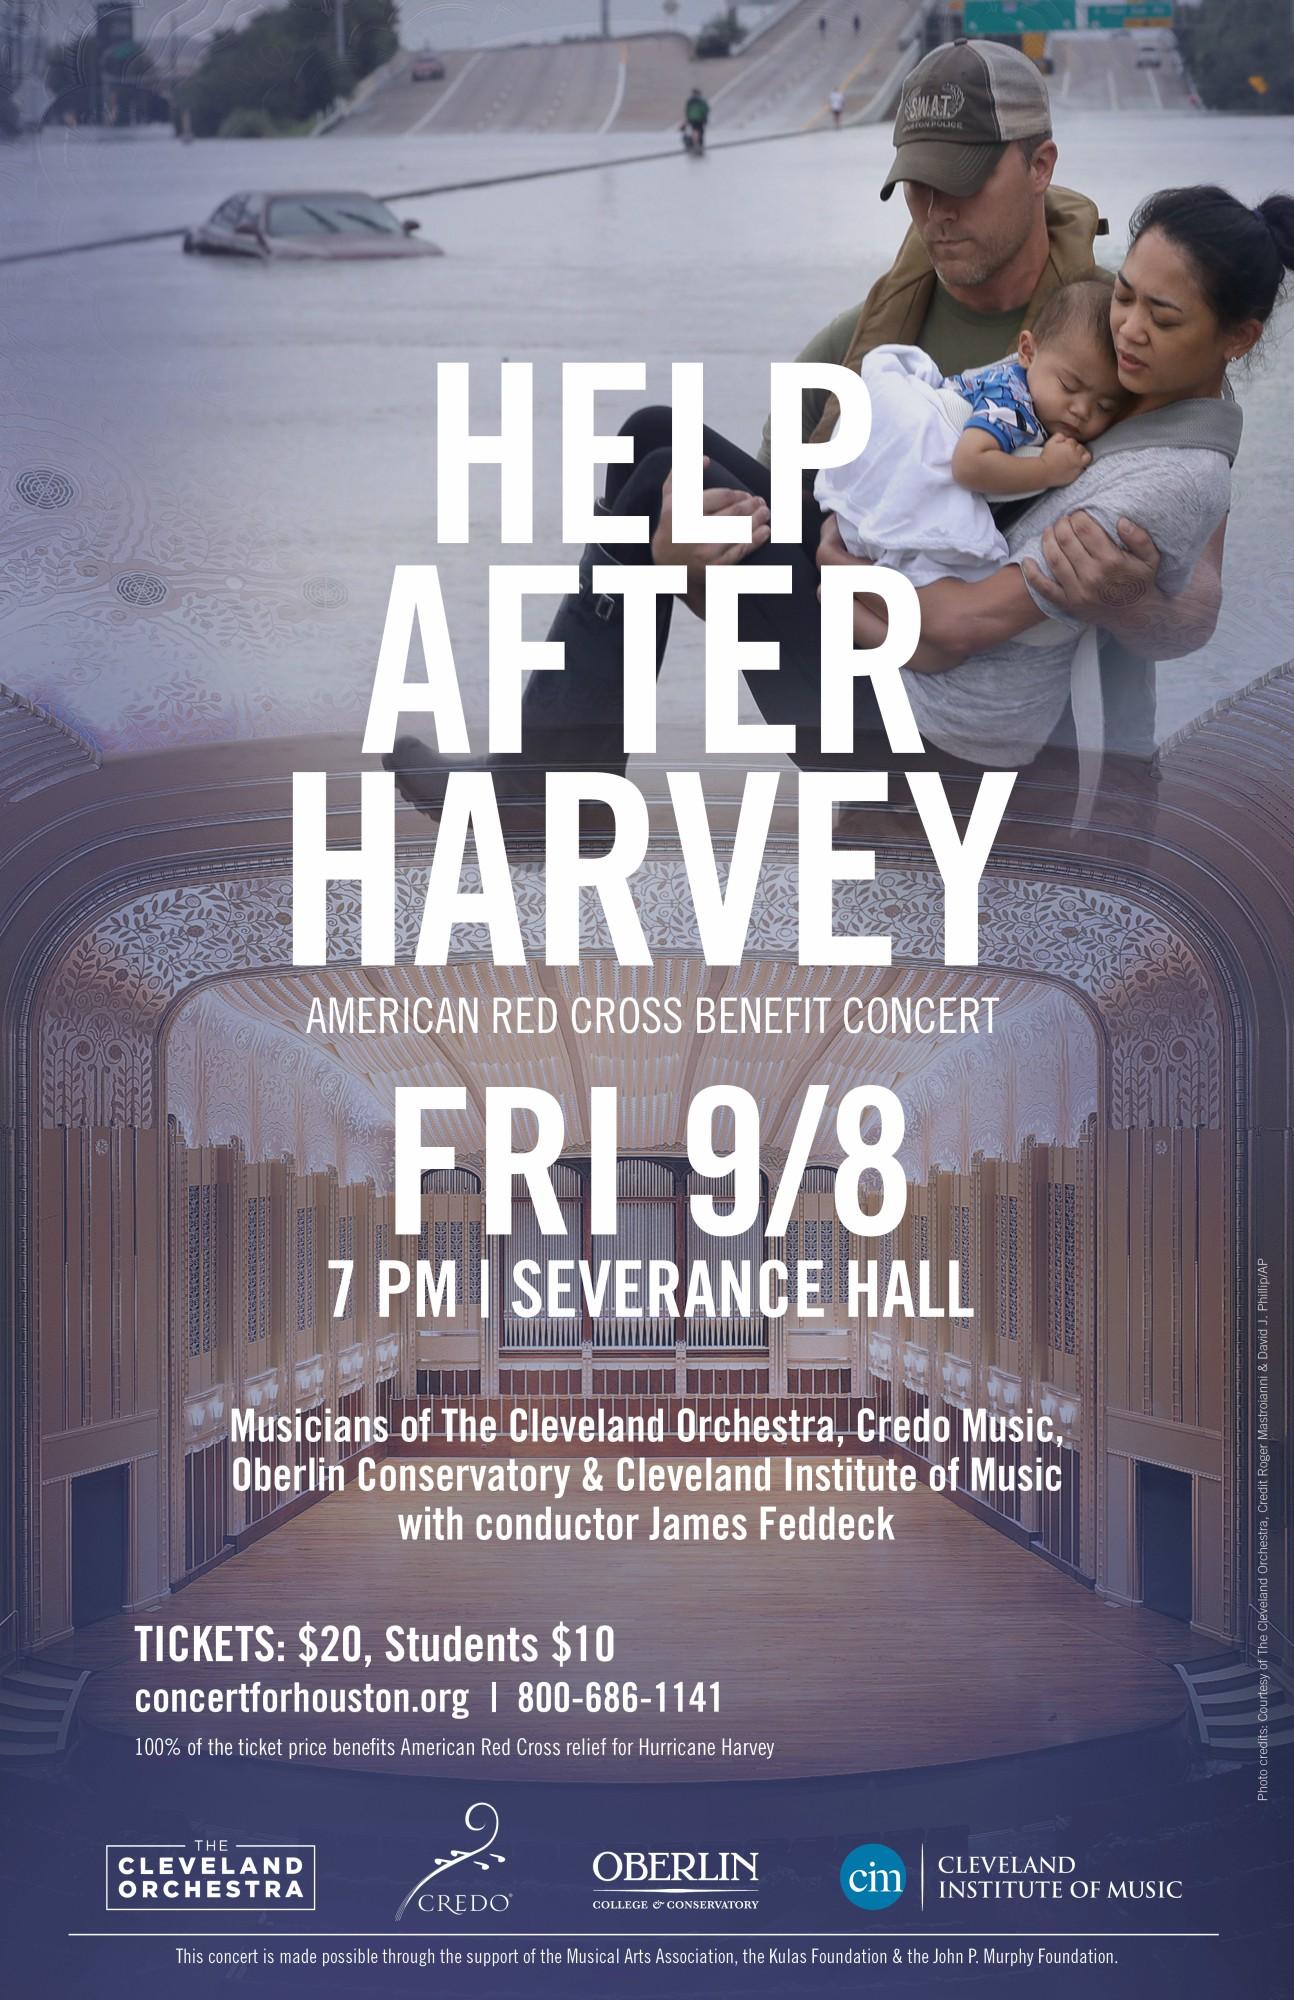 HelpAfterHarvey_Sept8_Severance